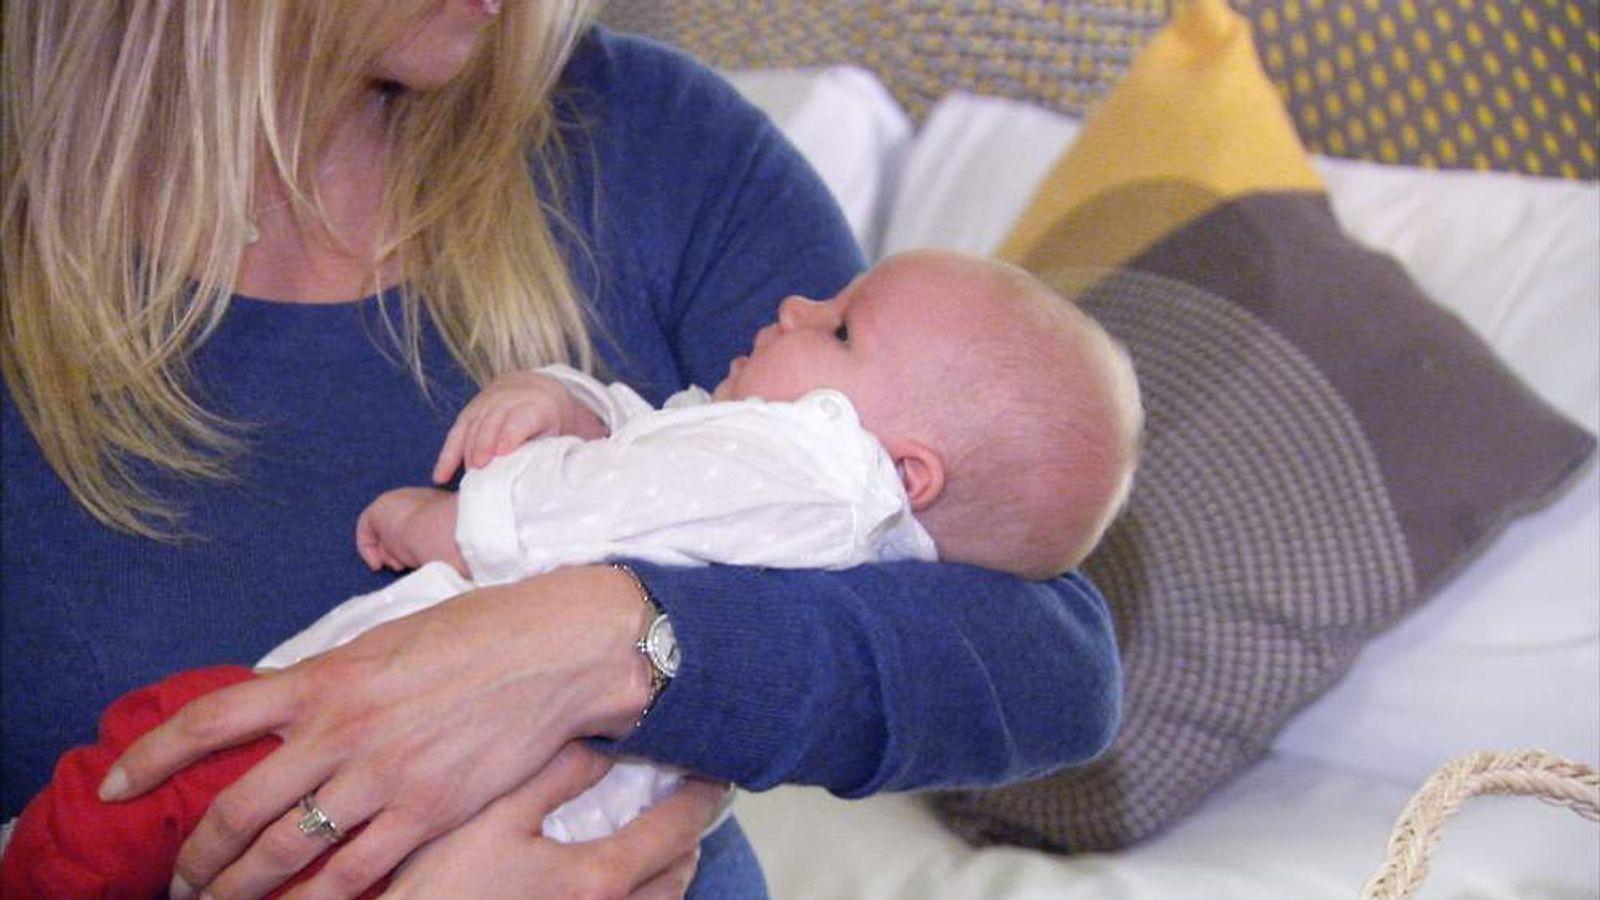 Caroline Stroud and her baby, Zara